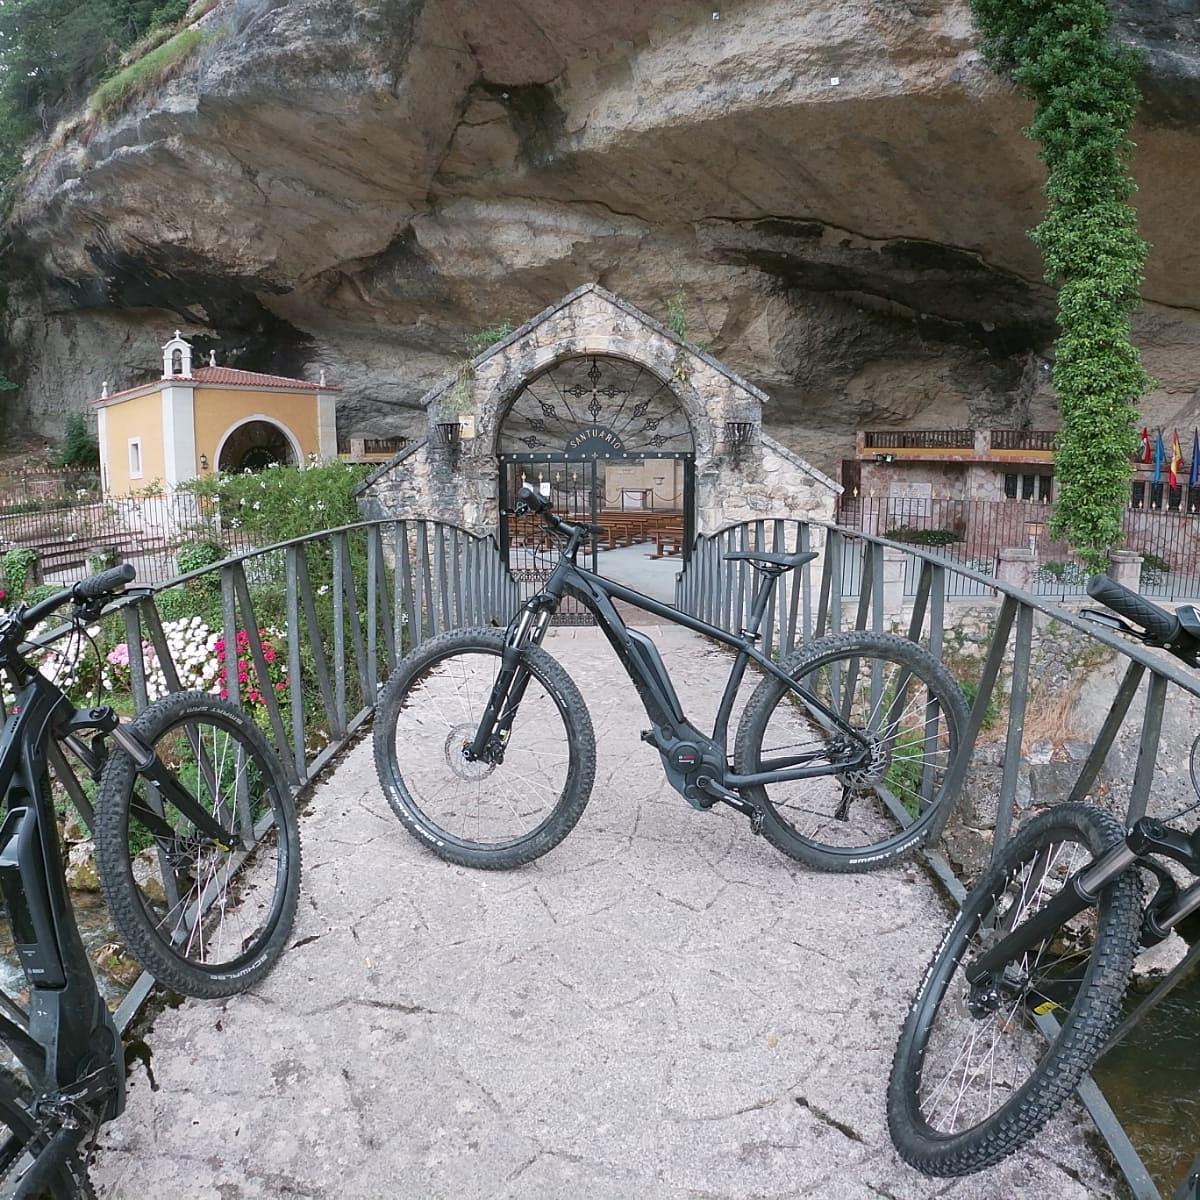 Vista obligada en Piloña, La Cueva, naturaleza, historia, simbología. https://t.co/Sw2n0mnyEV #puraaventurayocio #bike #bikeinstagram #piloña #btt #turismoasturias #turismonacional  #ebike #bicielectrica #alquilerdebicicletaselectricas #vistapiloña #tierradeasturcones @alexur10👍 https://t.co/afMSmol8tV